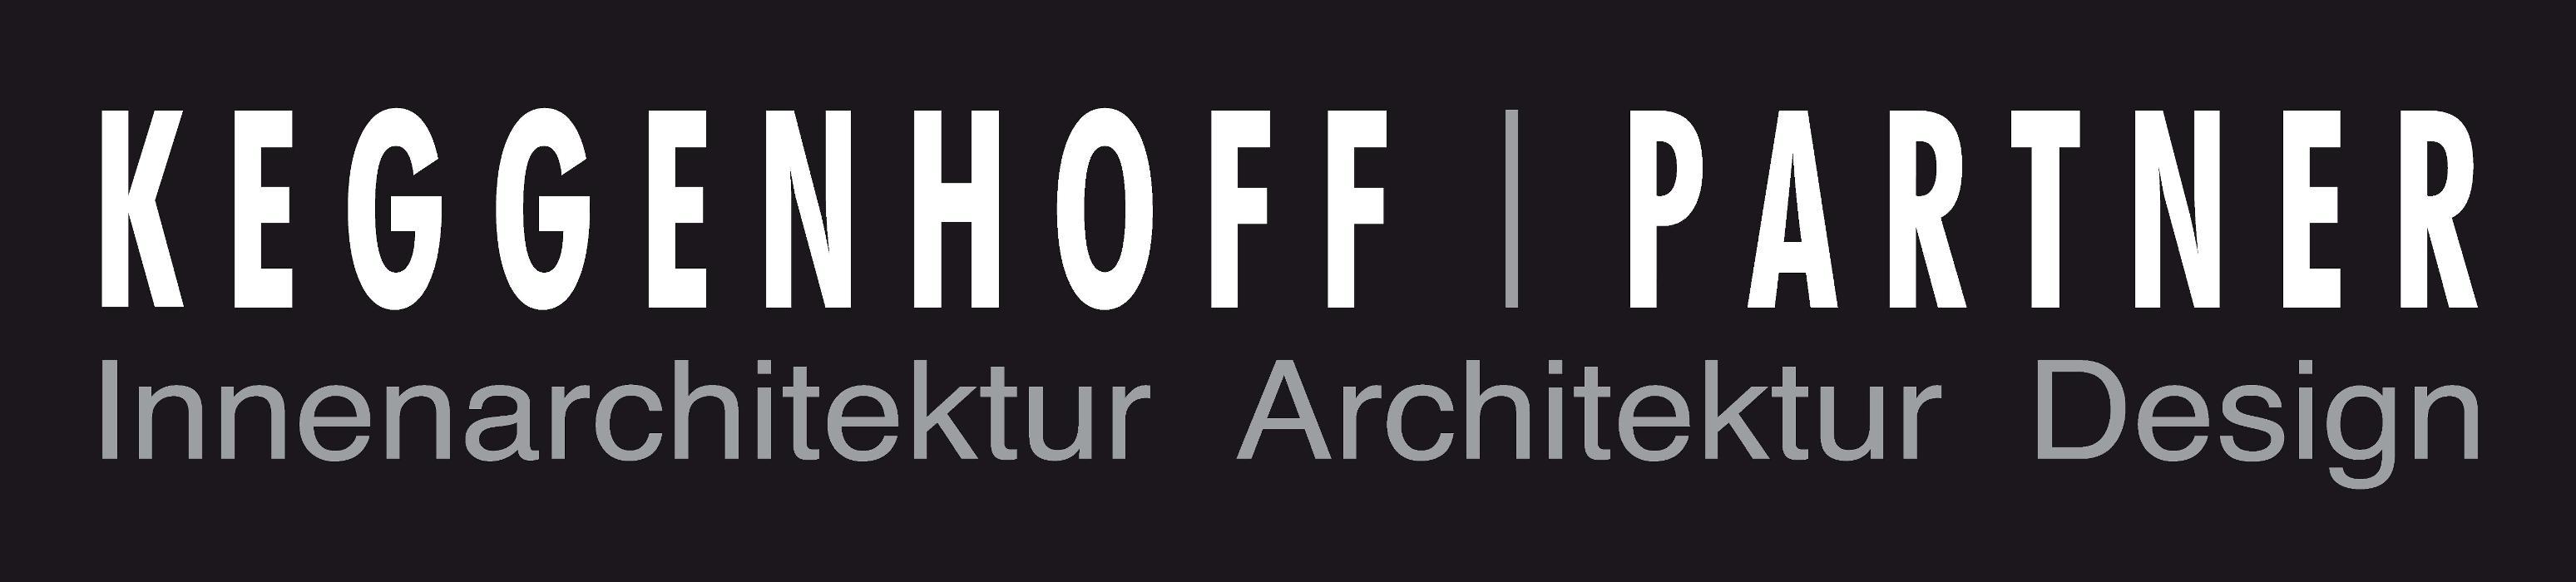 Bild zu KEGGENHOFF I PARTNER Architektur Innenarchitektur Design in Arnsberg